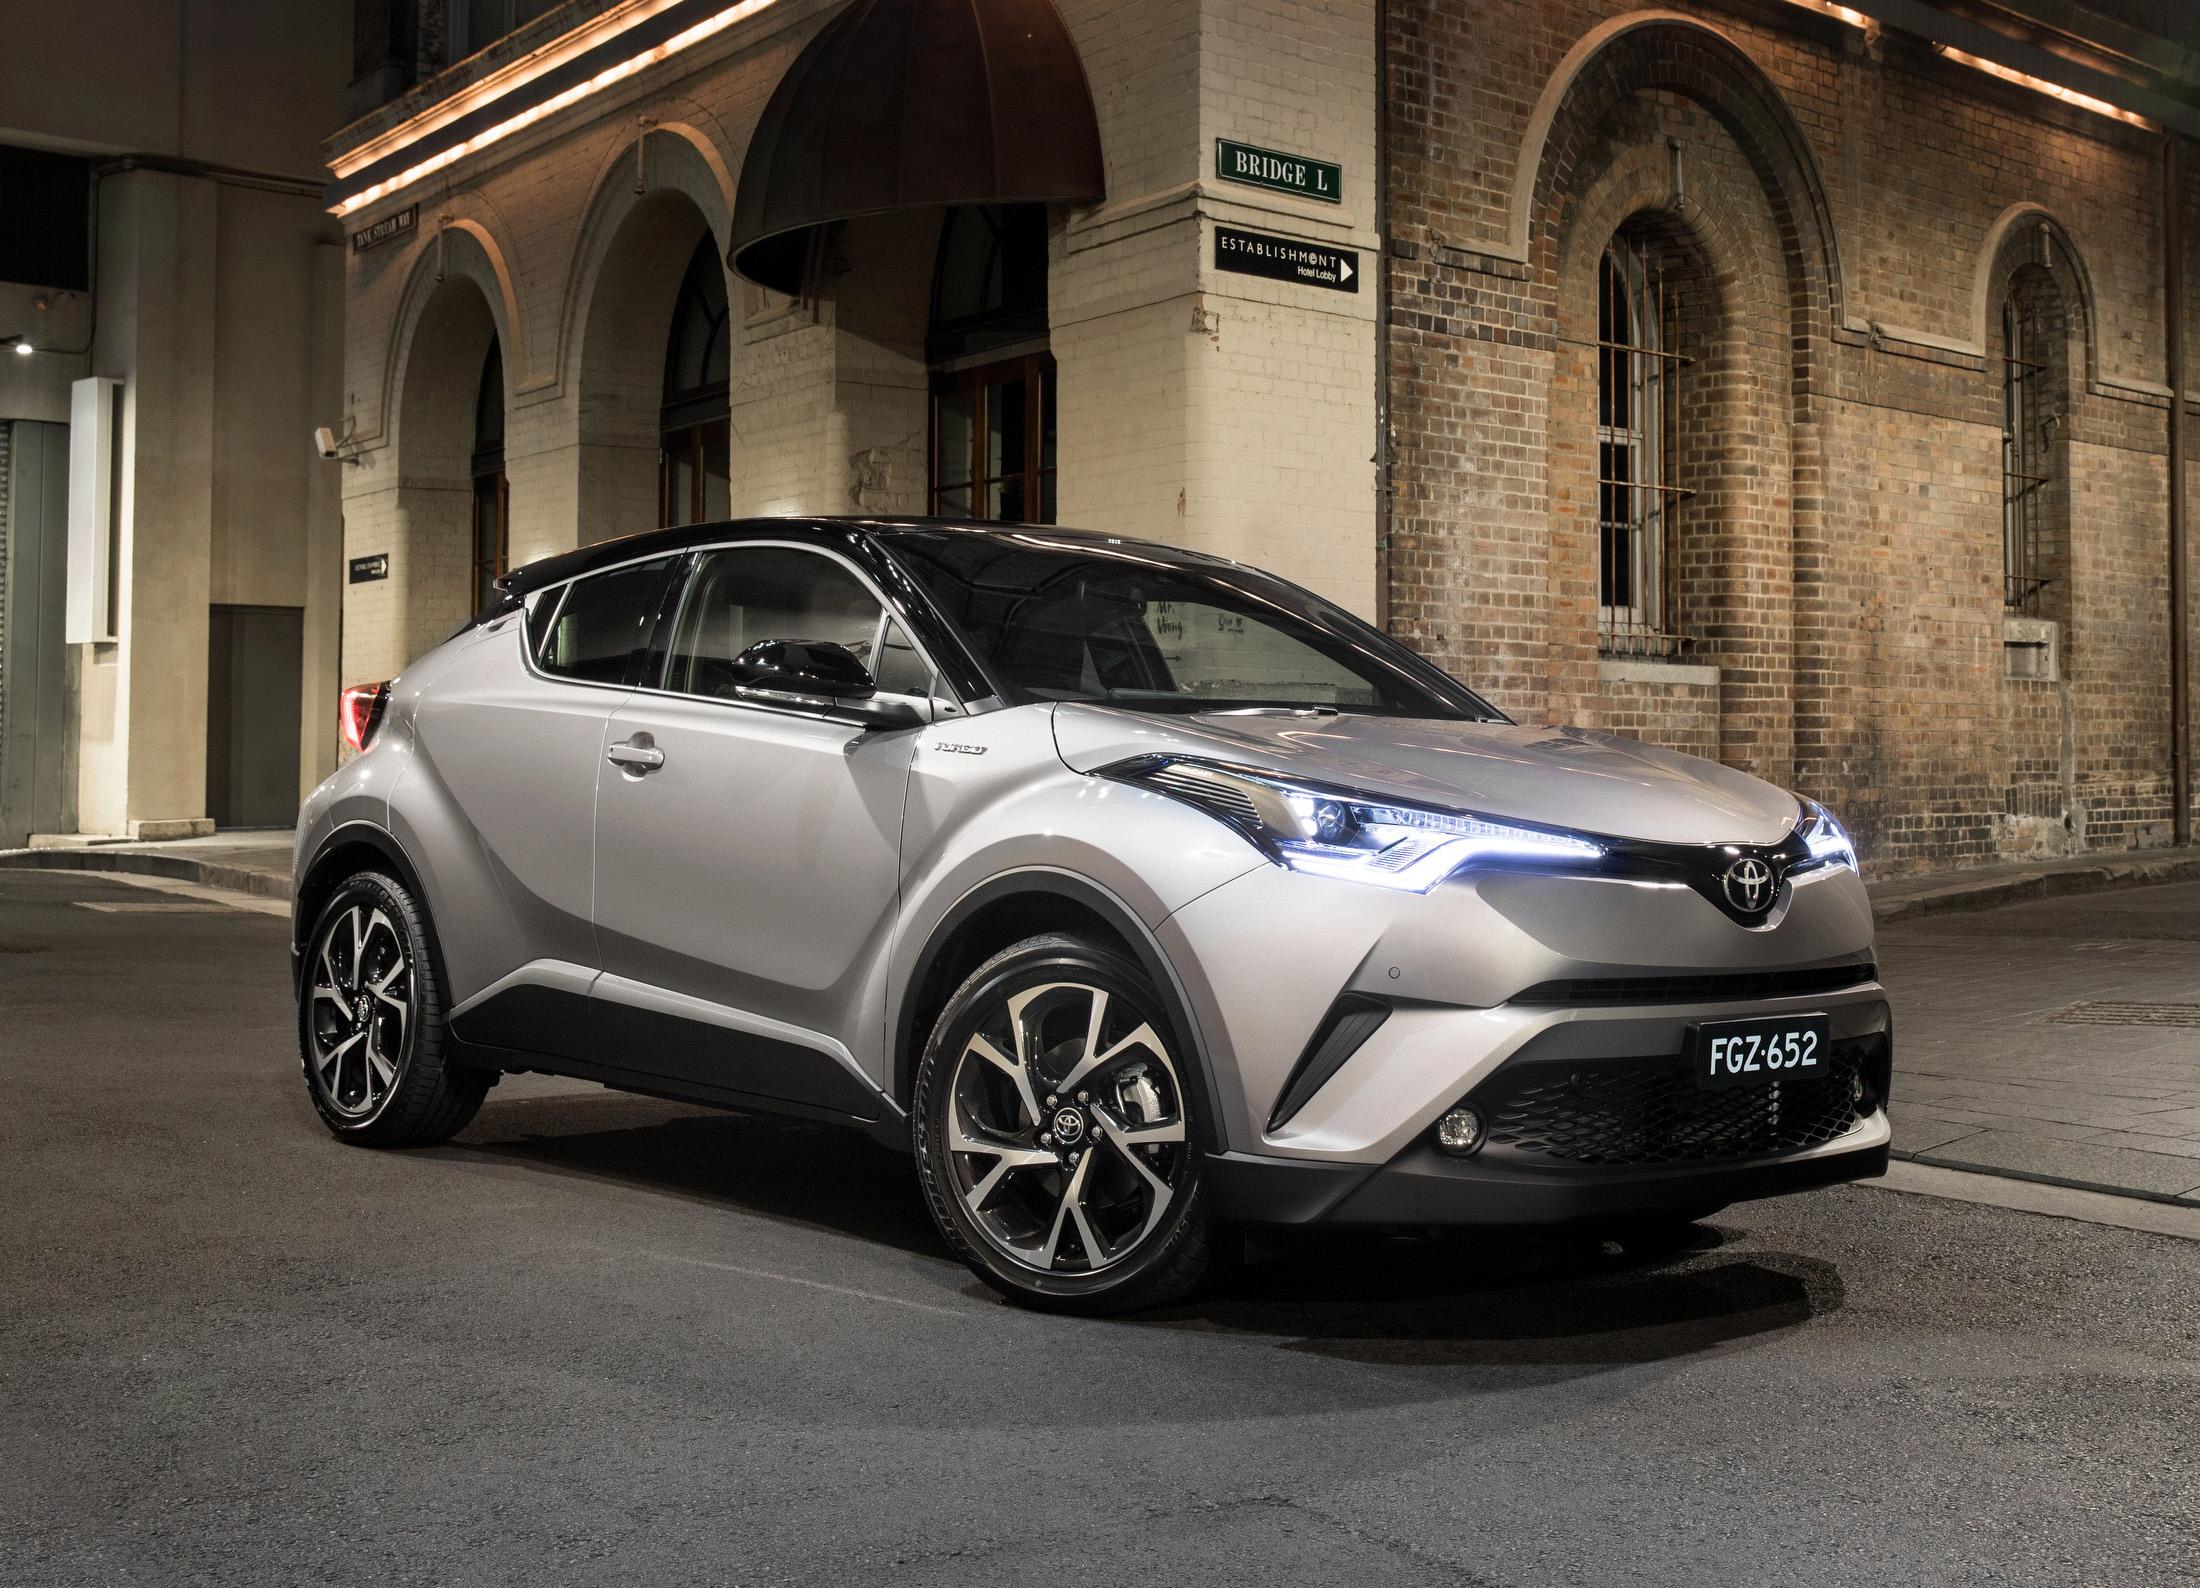 Toyota Chr Price >> News - Toyota C-HR Arrives Down Under, Pricing & Specs ...